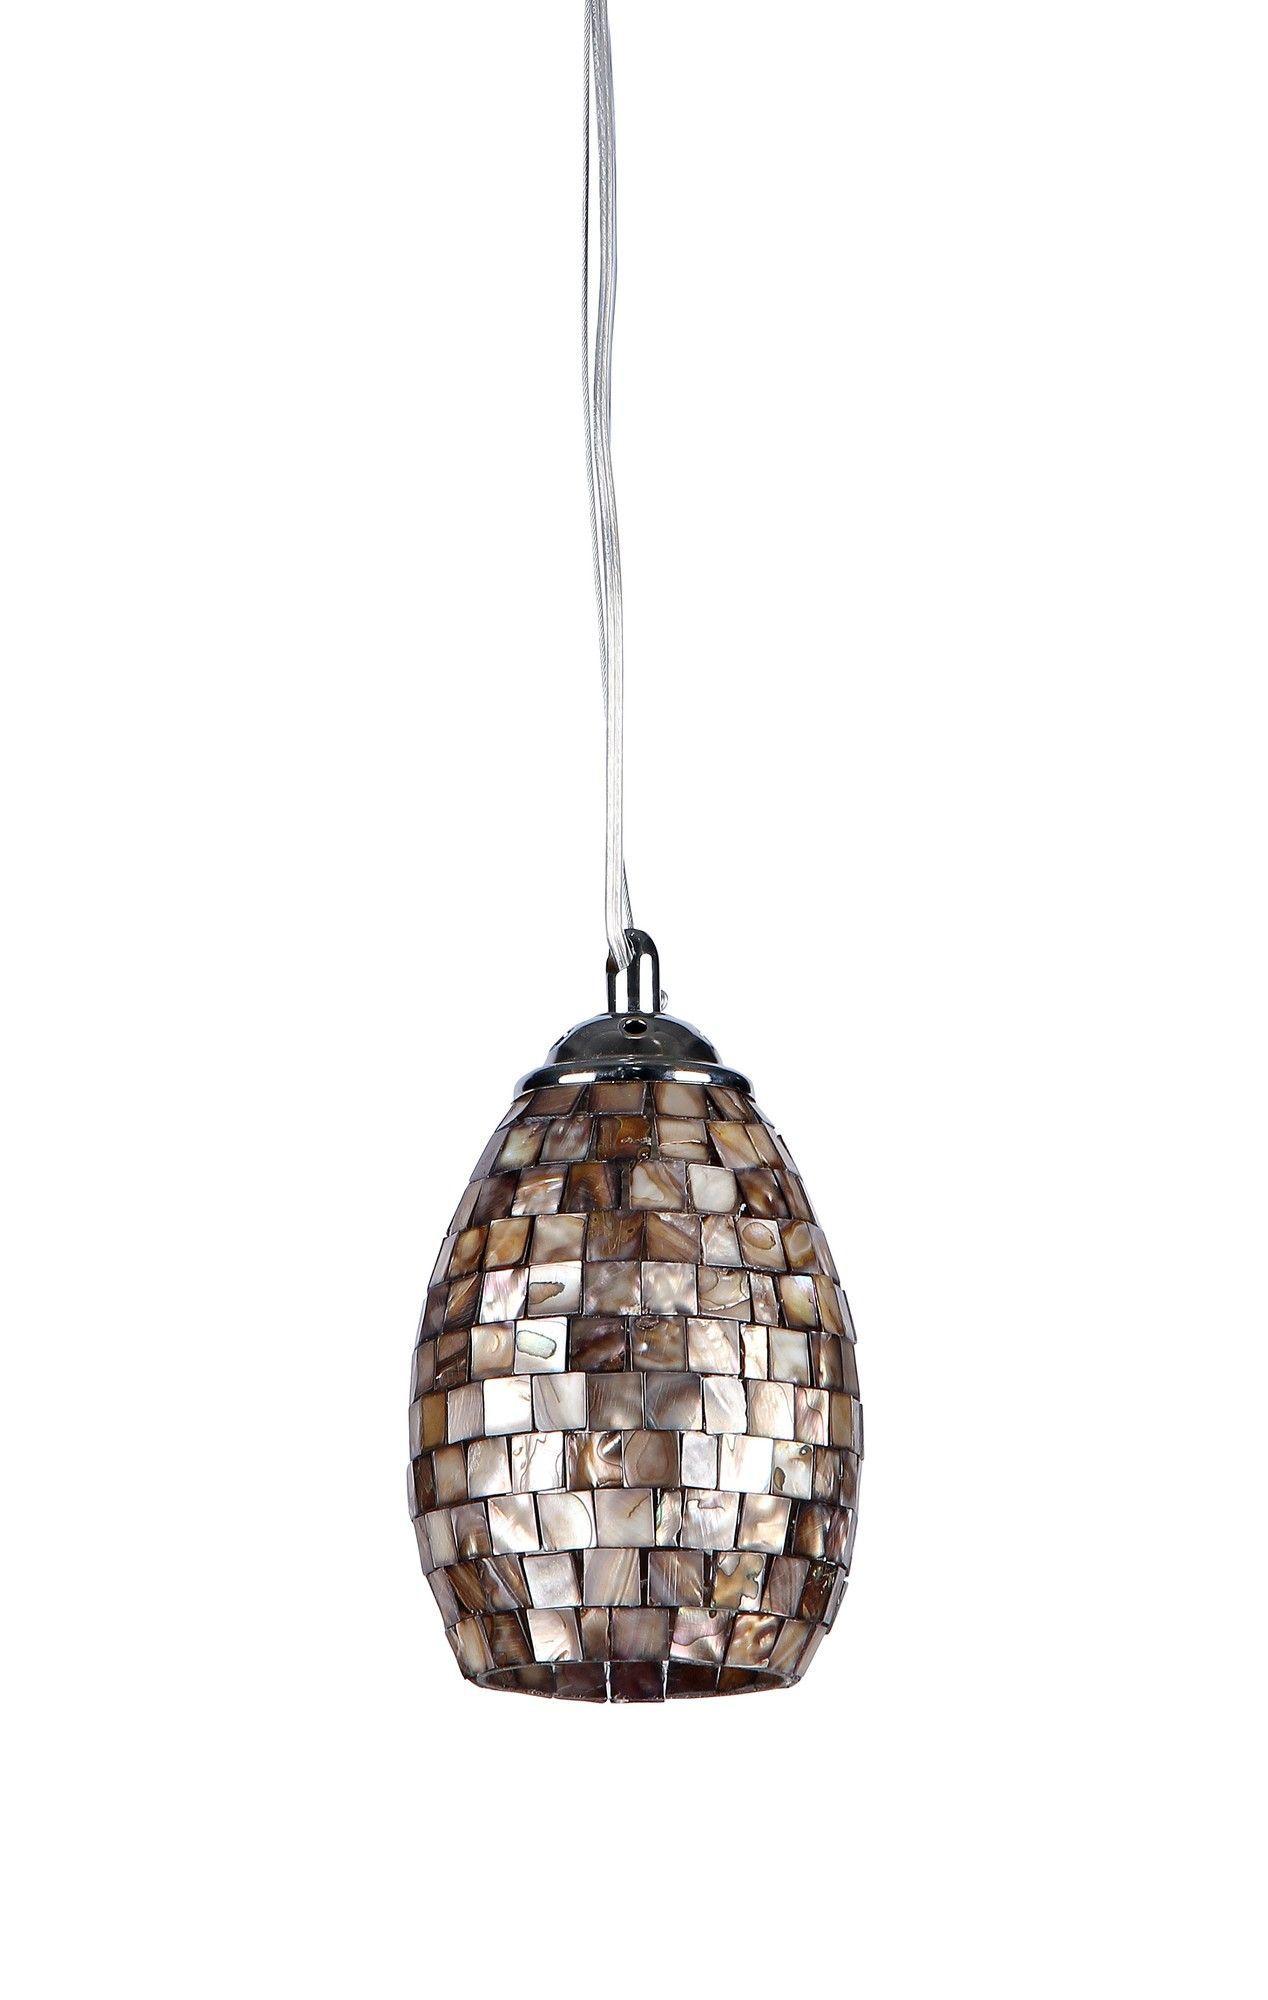 Chloe Lighting Mosaic 1 Light Ravenna Mini Pendant & Reviews